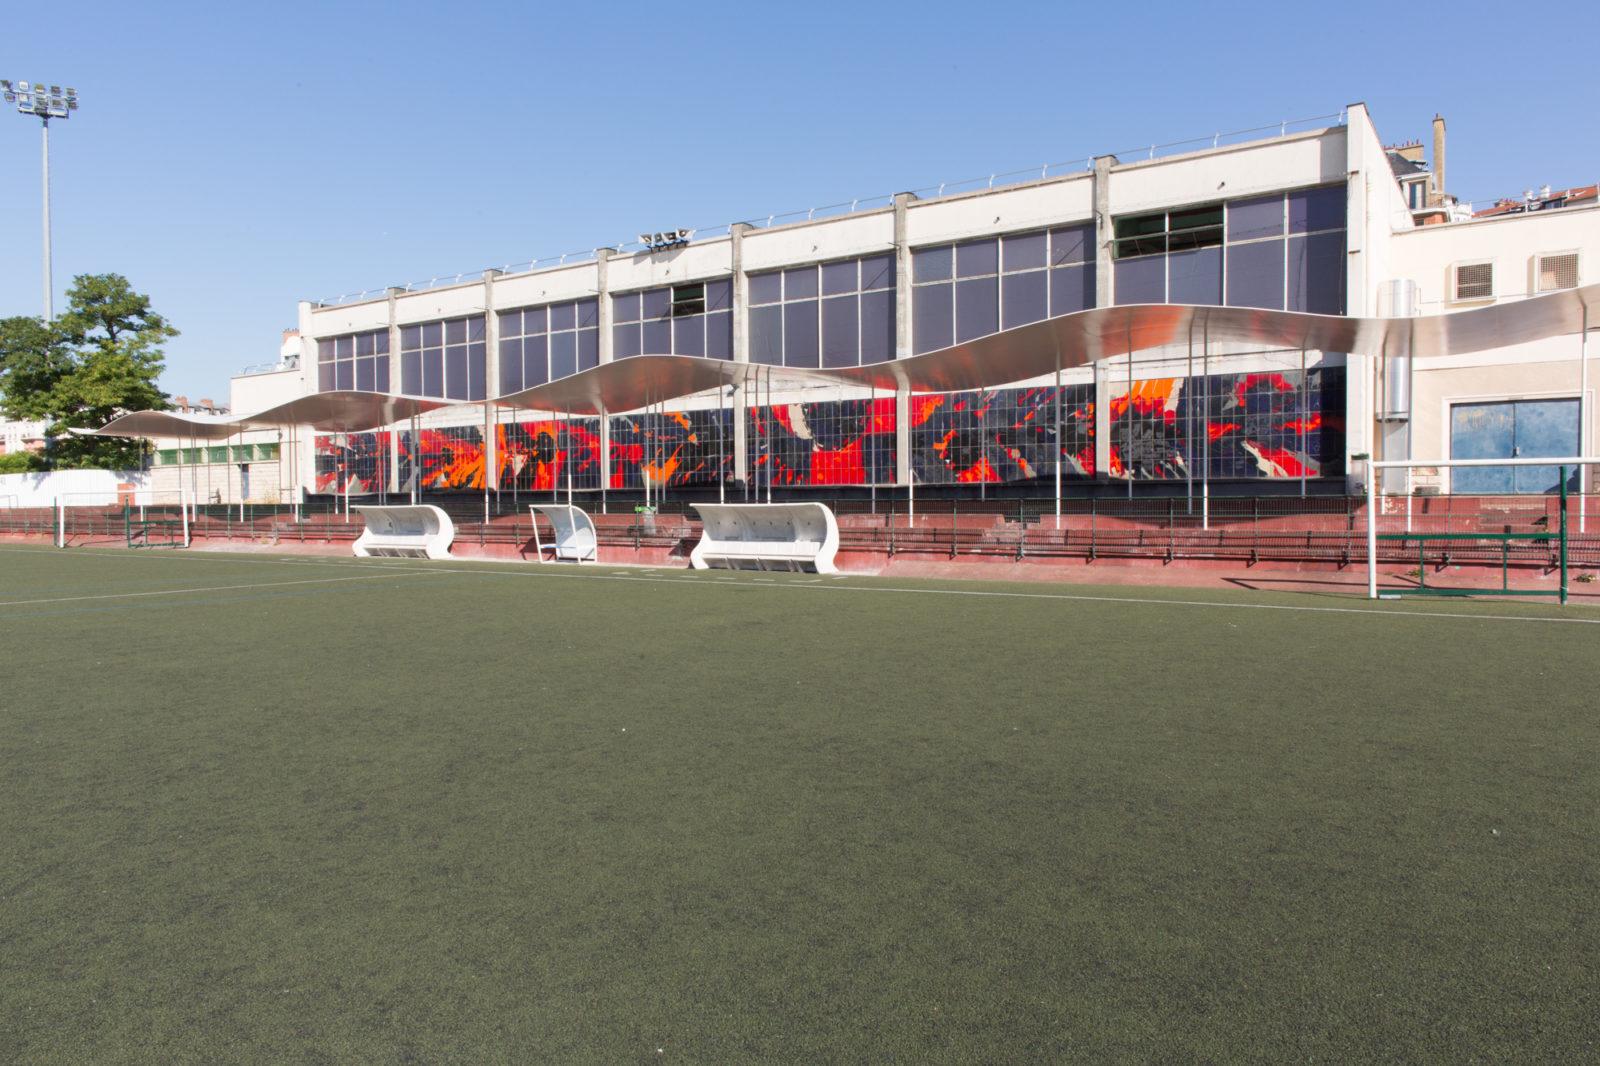 Severine-stade-auventsept-ld-5